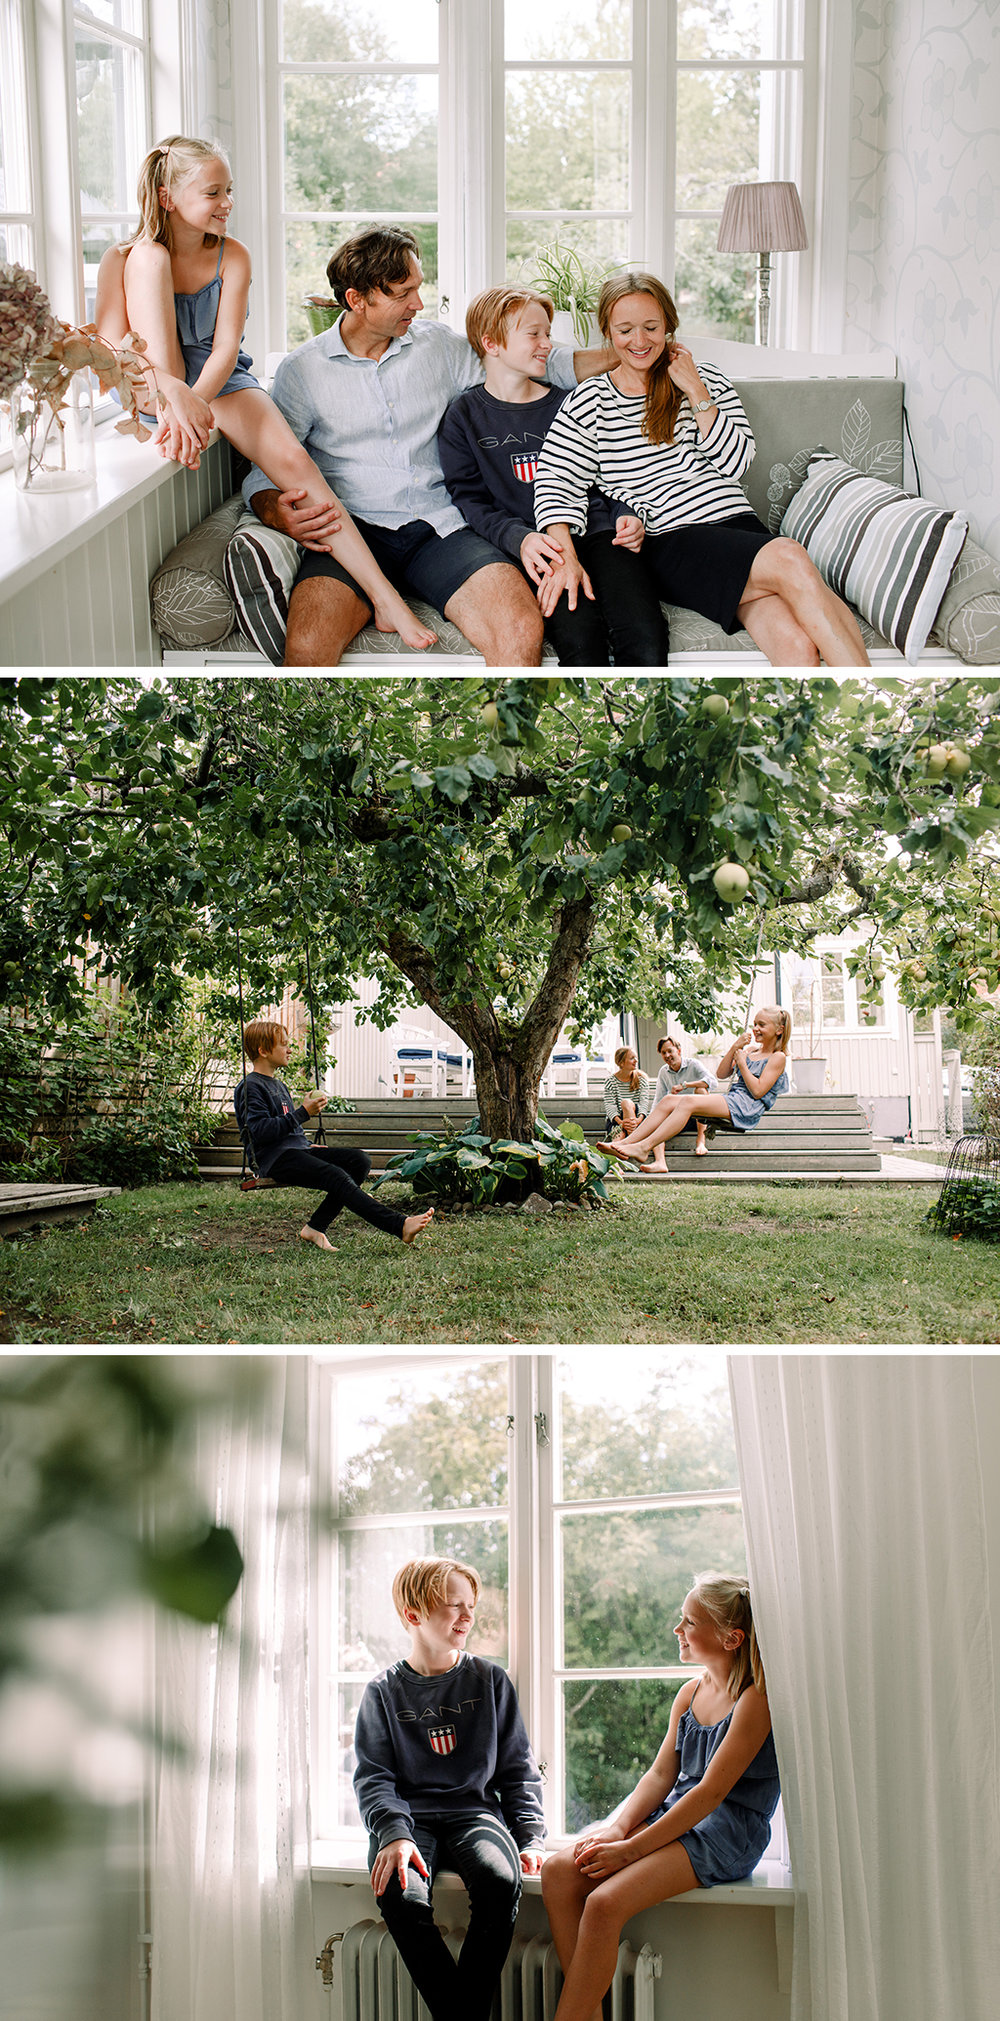 Hemmahosfotografering_Lifestyle_familjefotograf_Stockholm_4.jpg